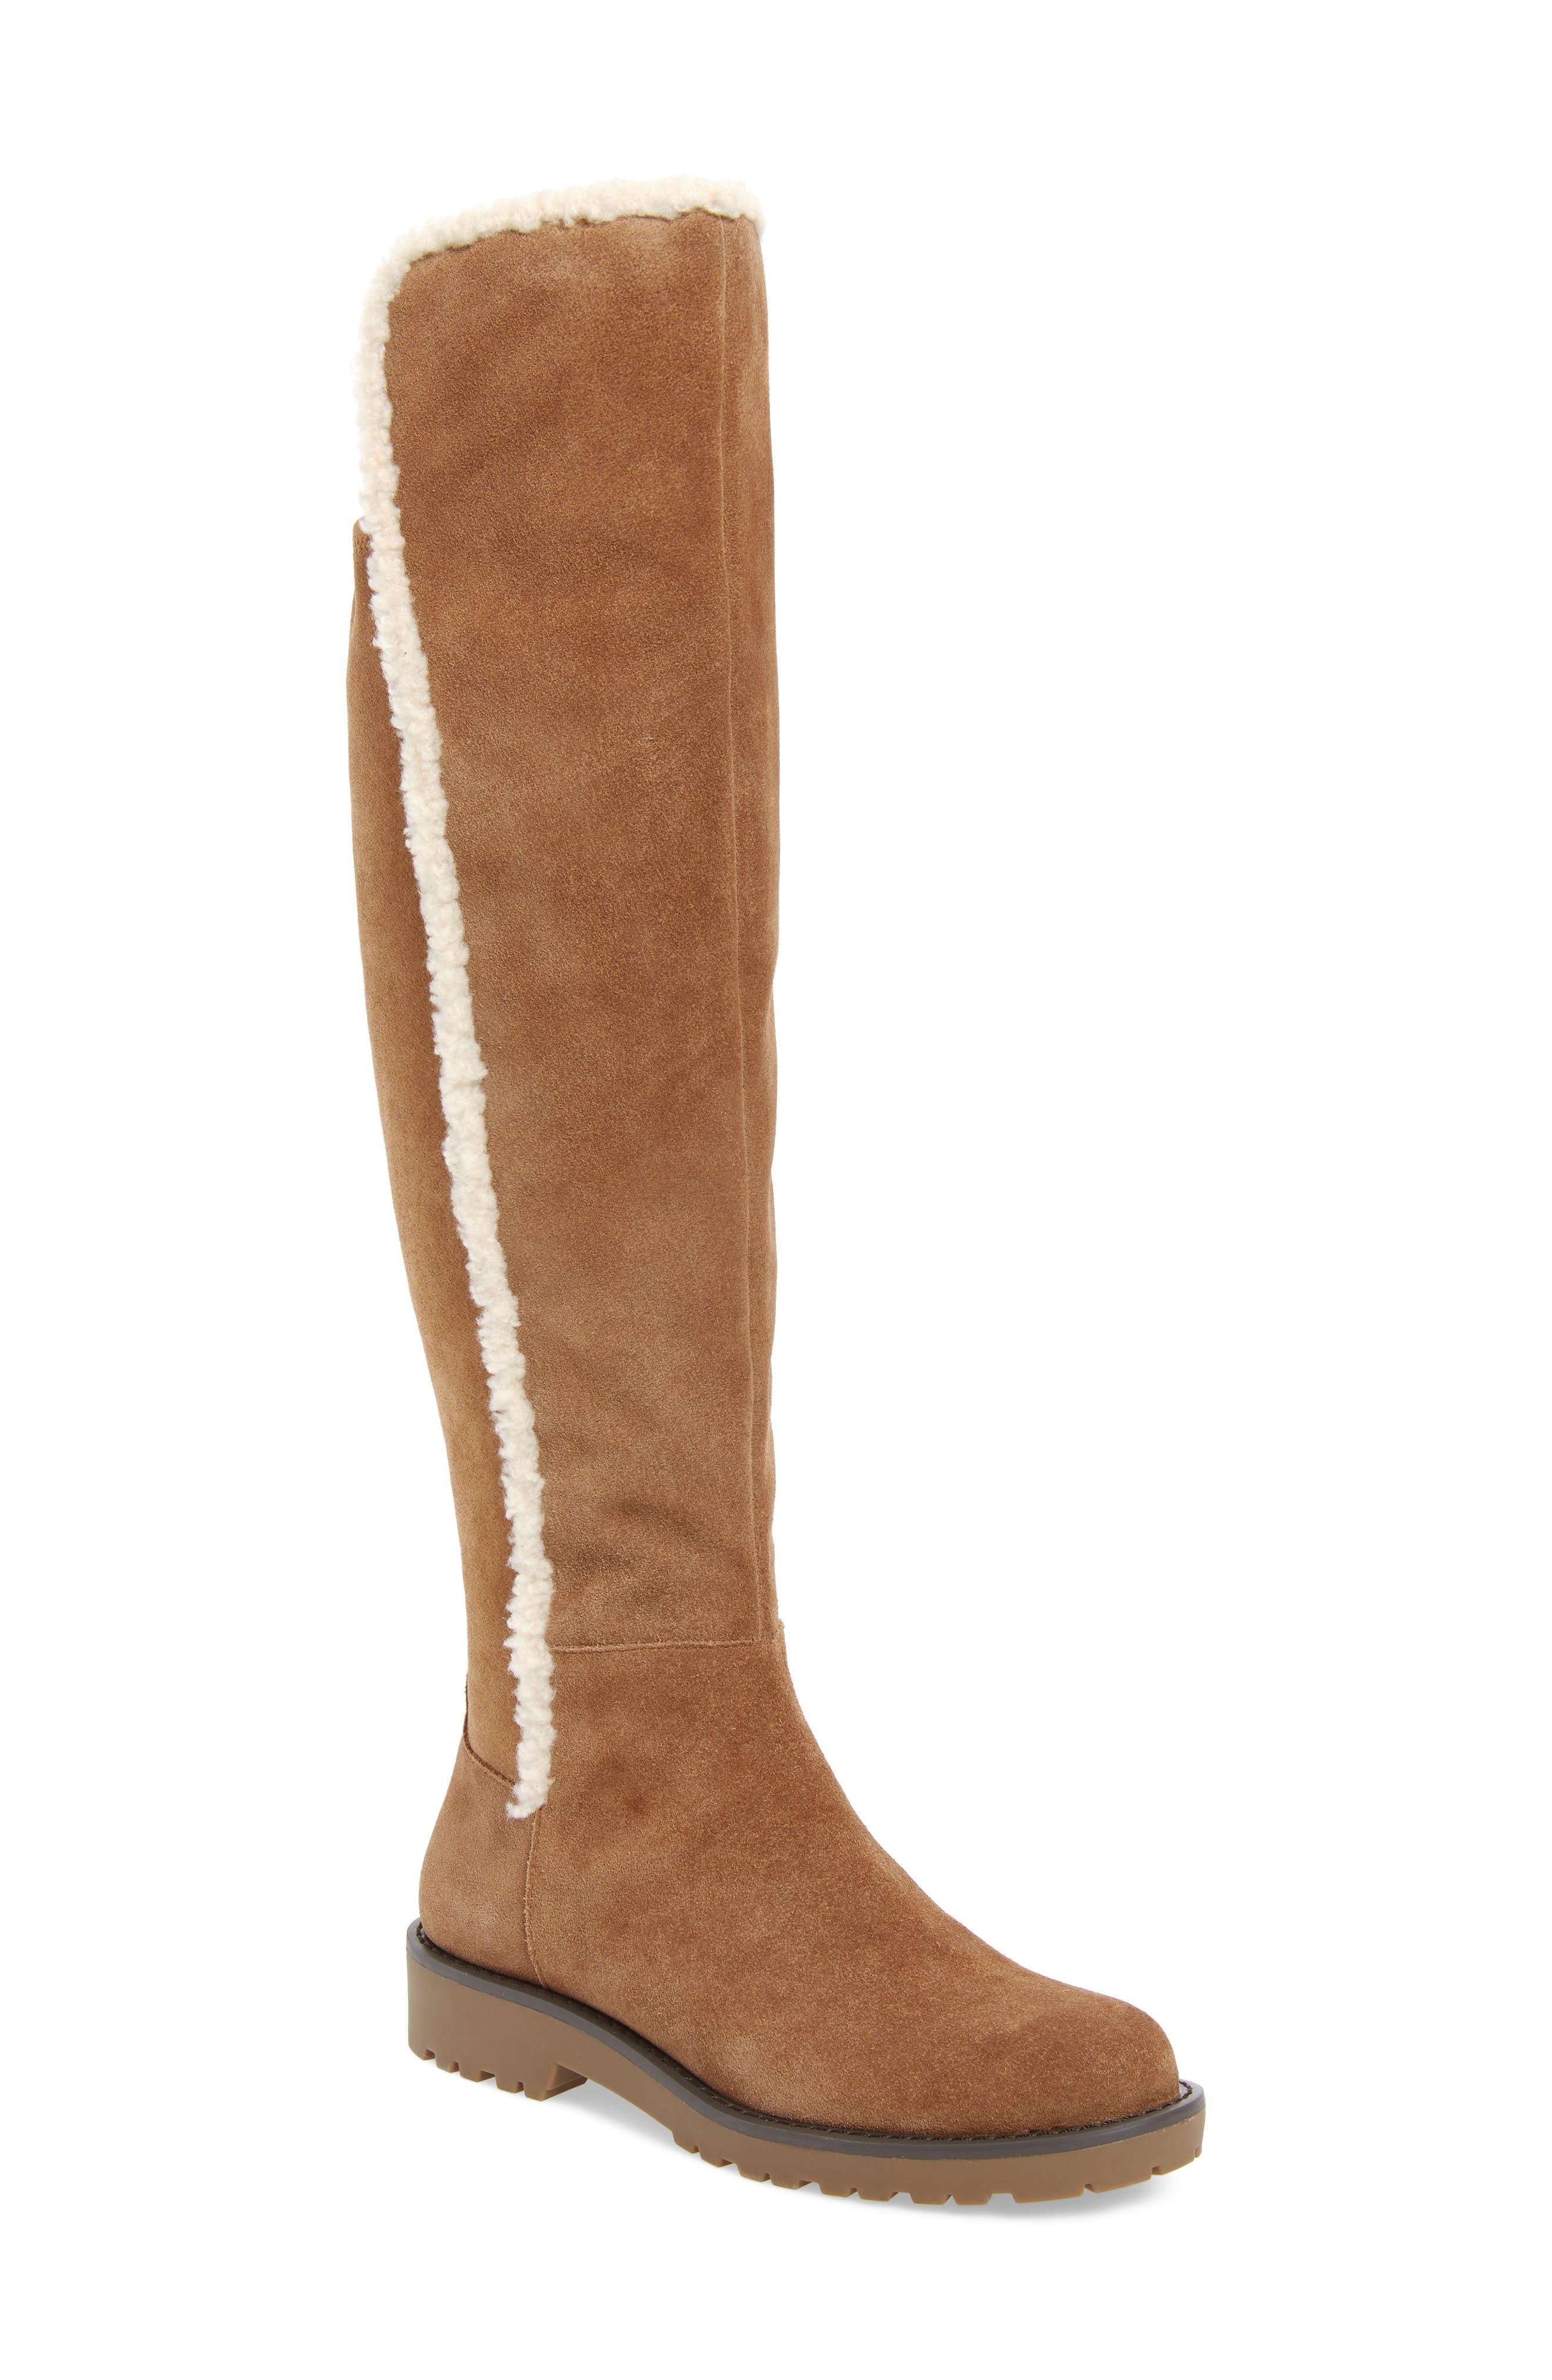 Juno Faux Shearling Trim Boot,                         Main,                         color, HONEY SUEDE